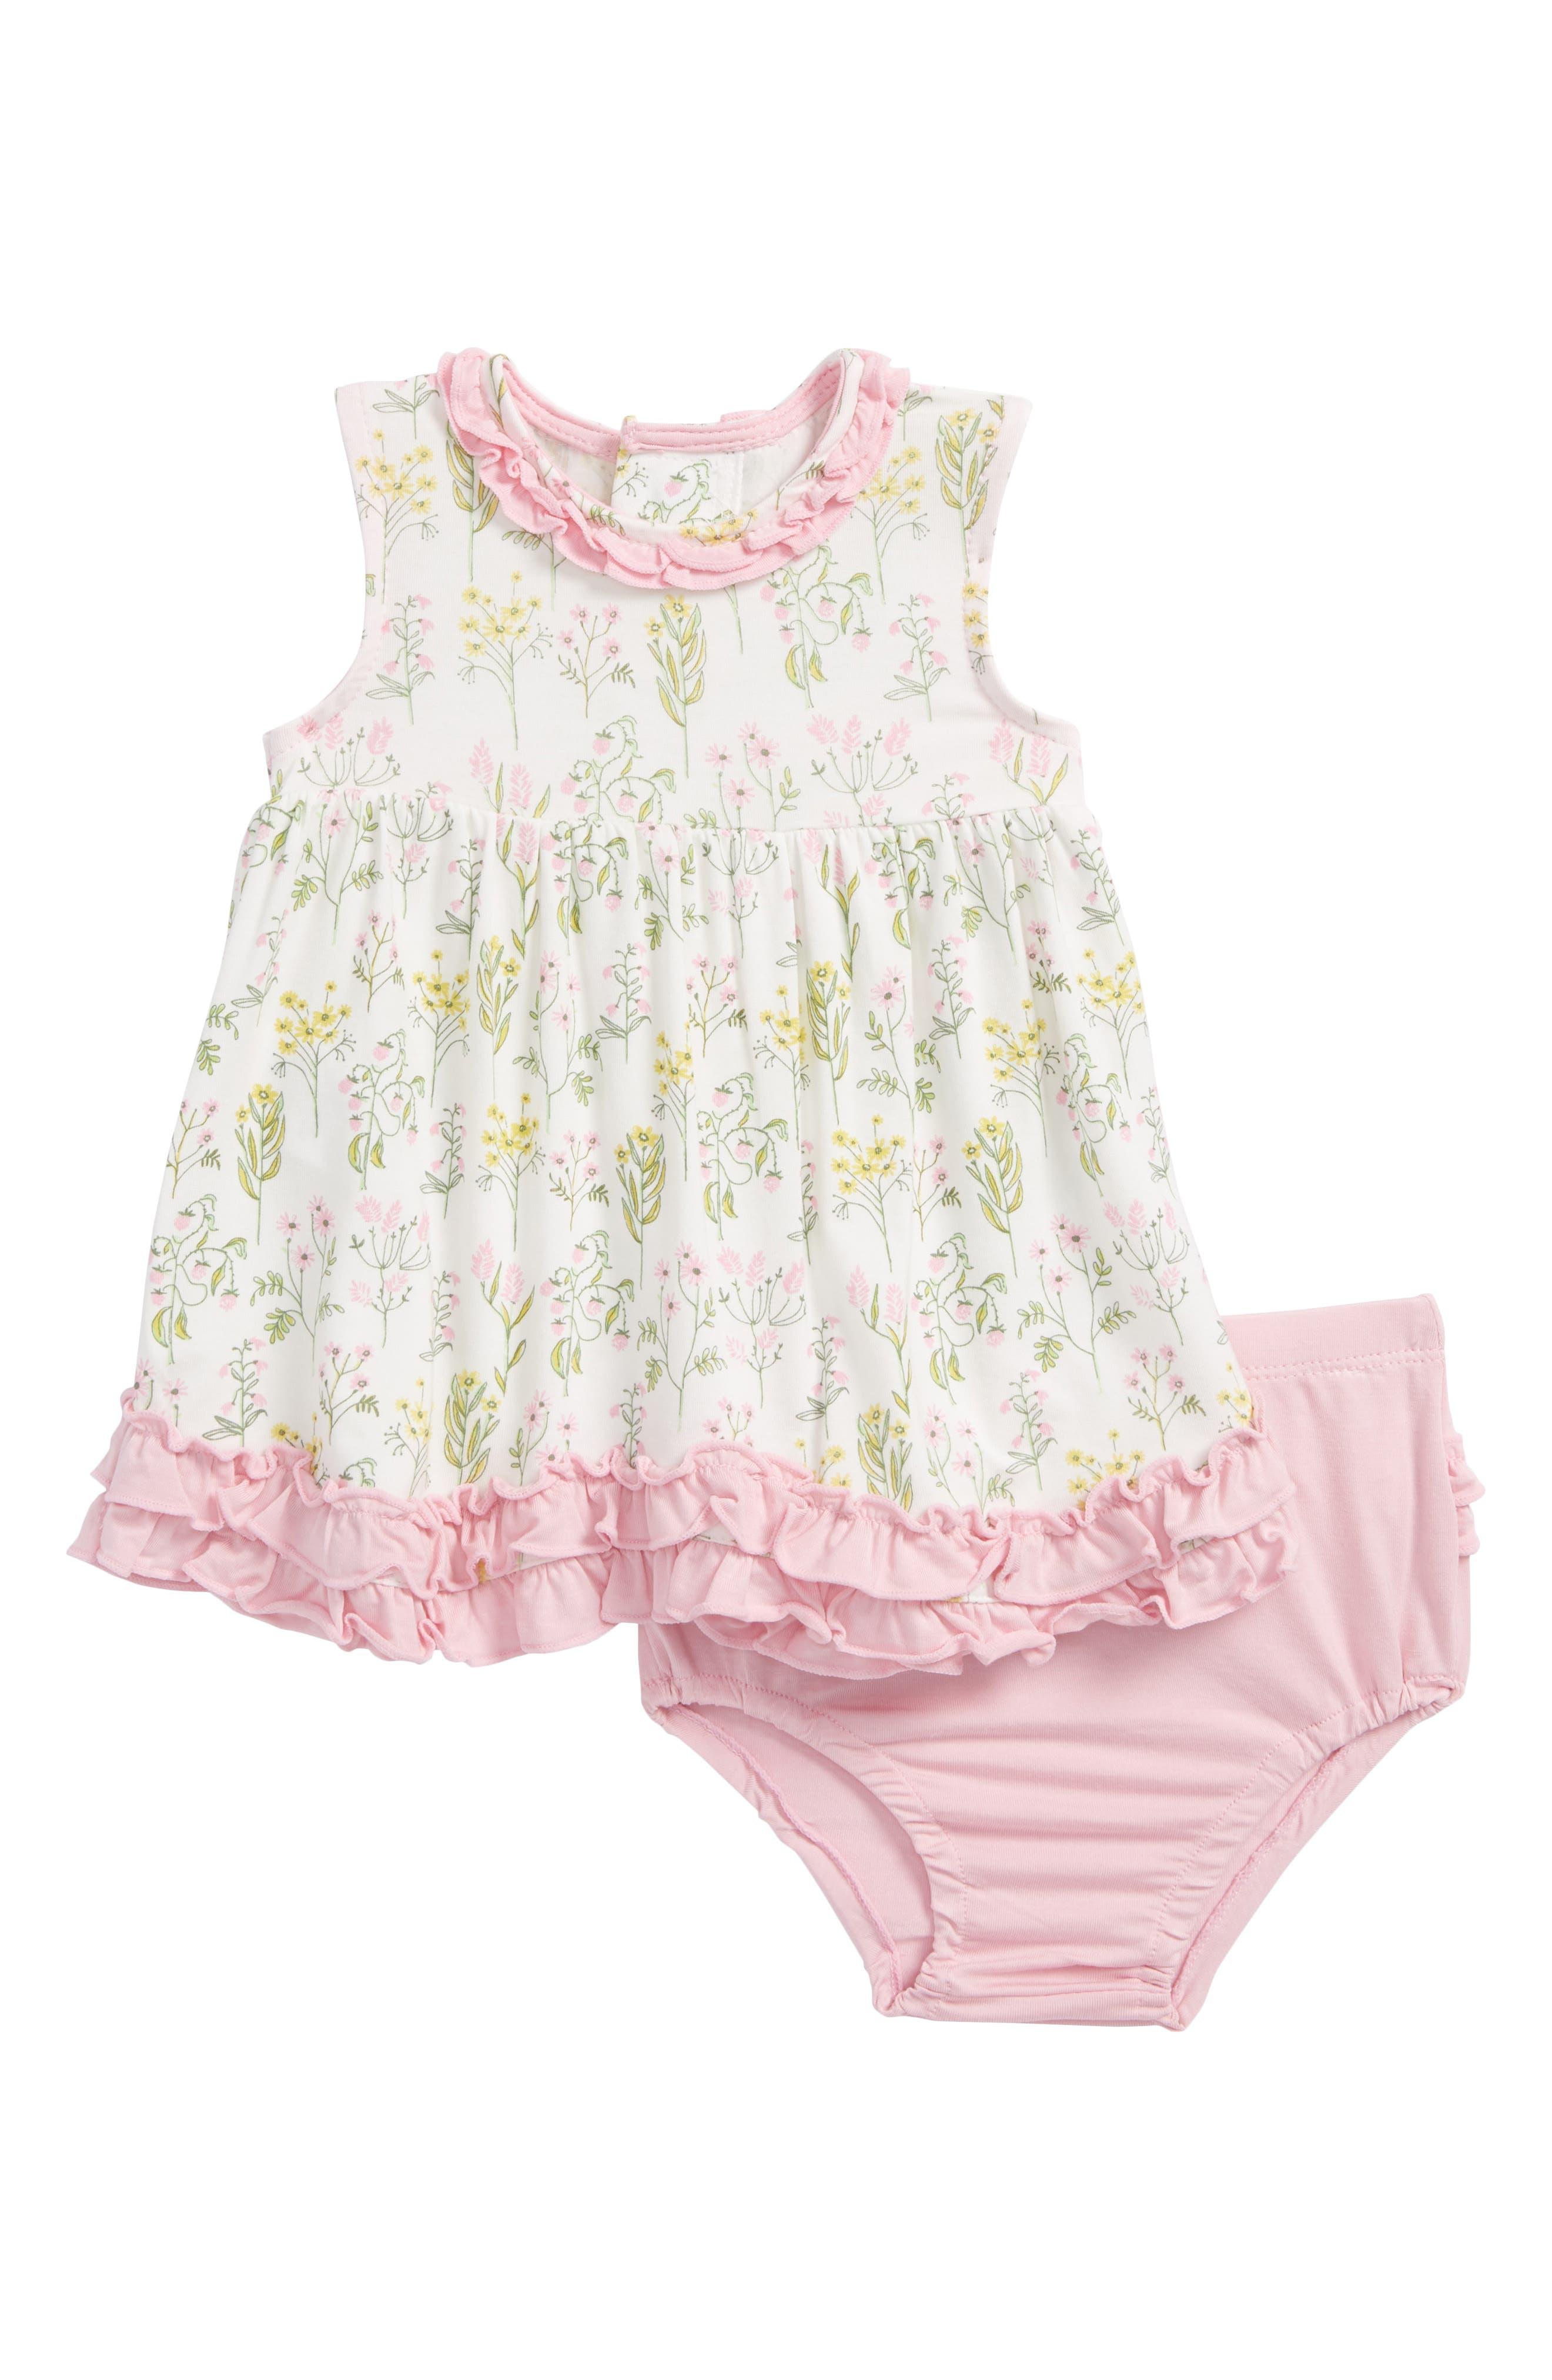 My Little Garden Dress,                             Main thumbnail 1, color,                             100